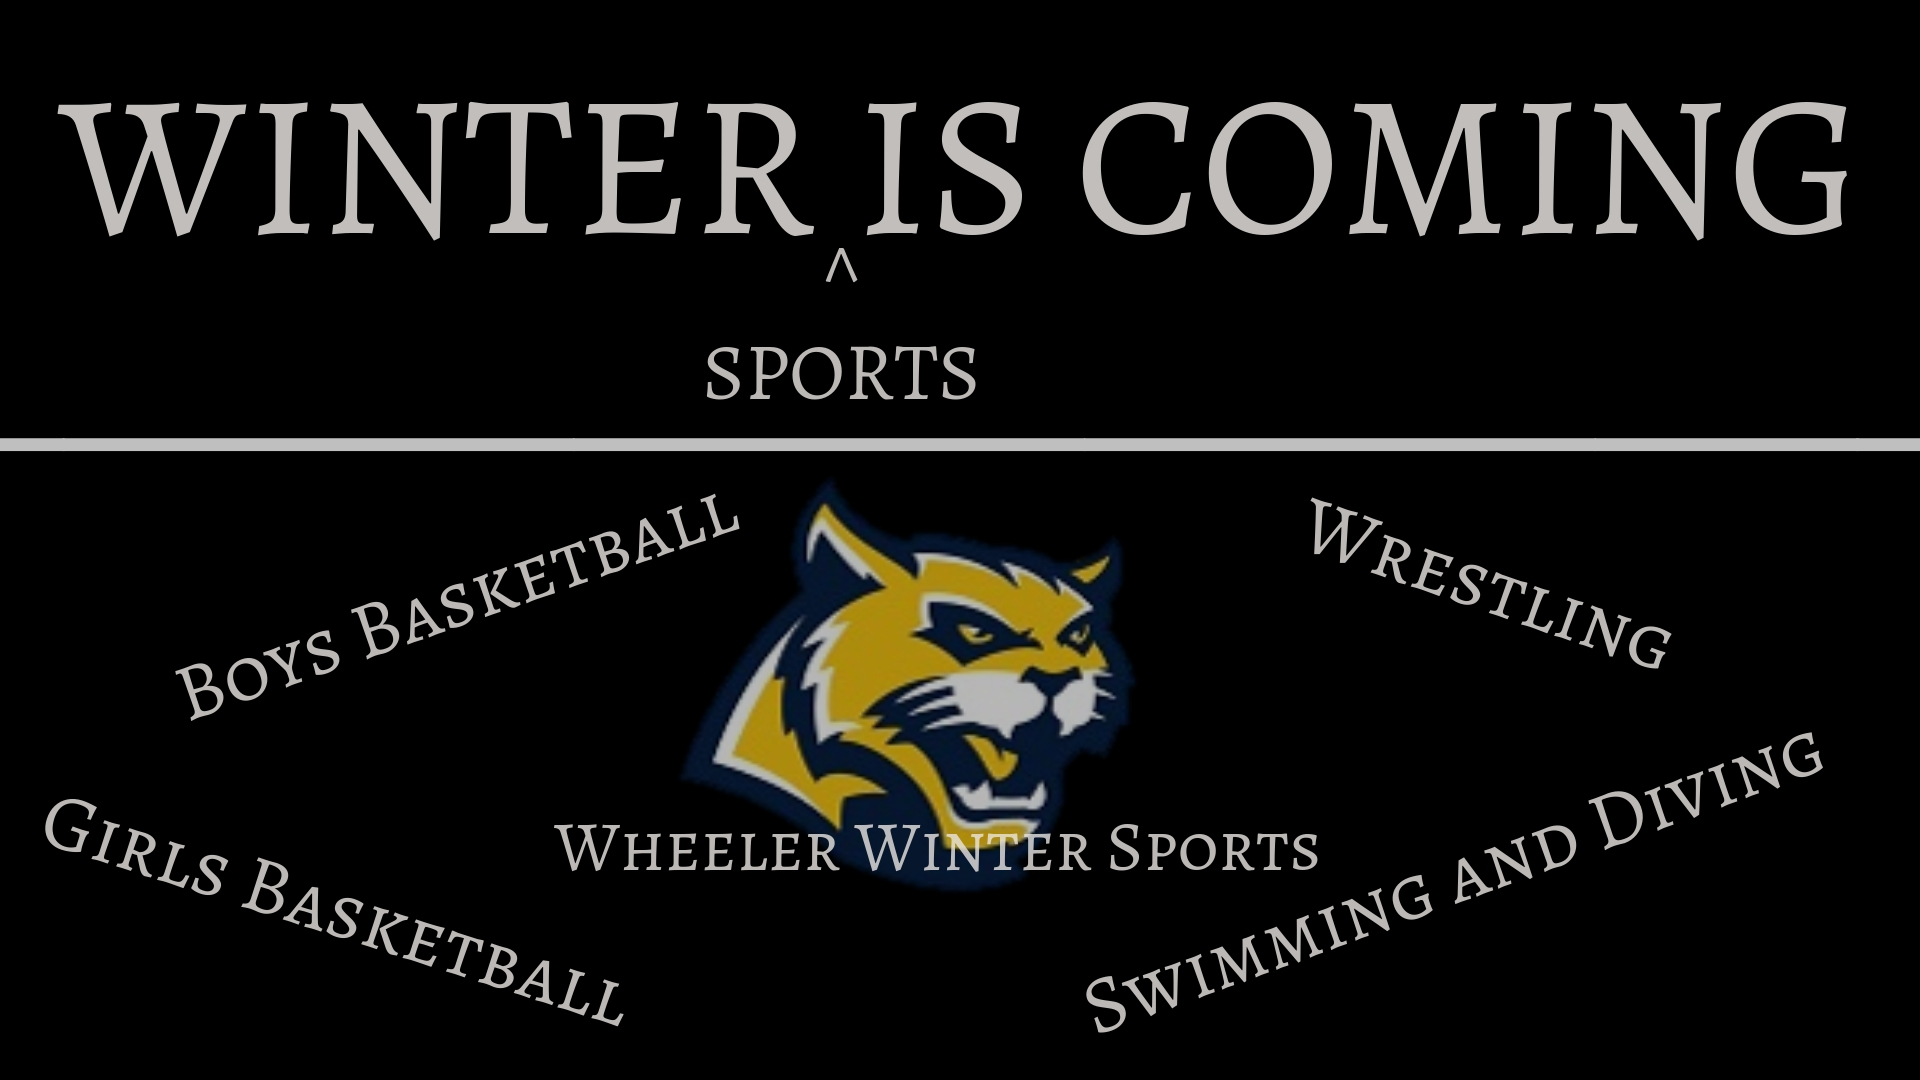 Wheeler Winter Sports